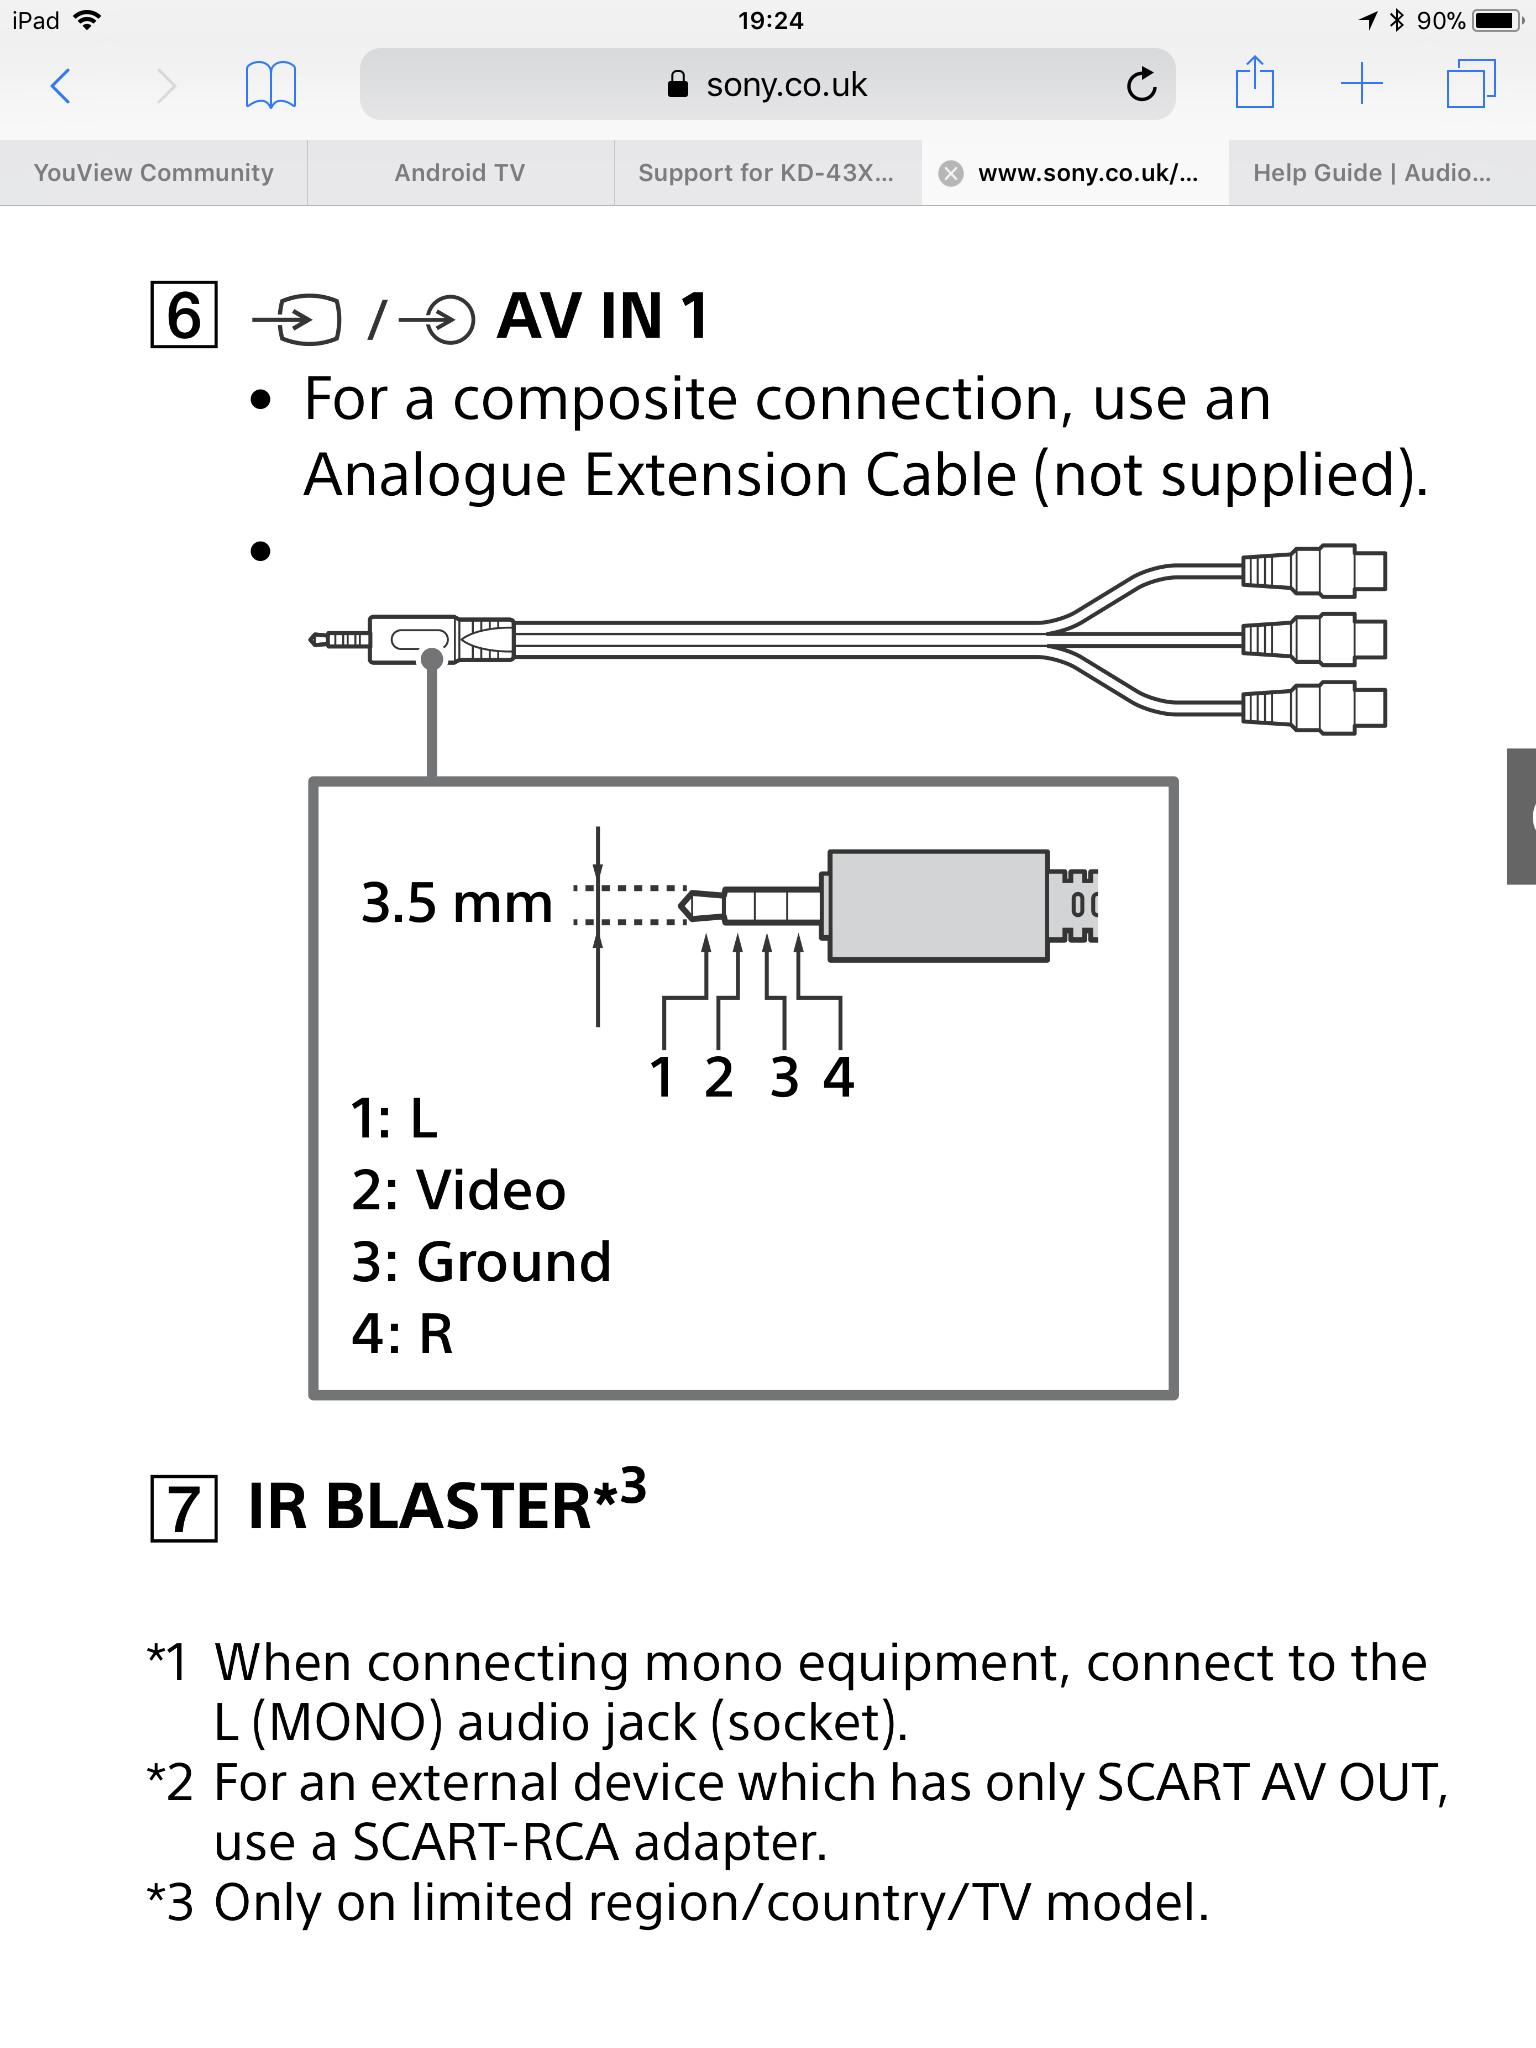 Plug Wiring Diagram Of Iphone 3 Trusted 5mm A V Jack Explained Diagrams 110v Av